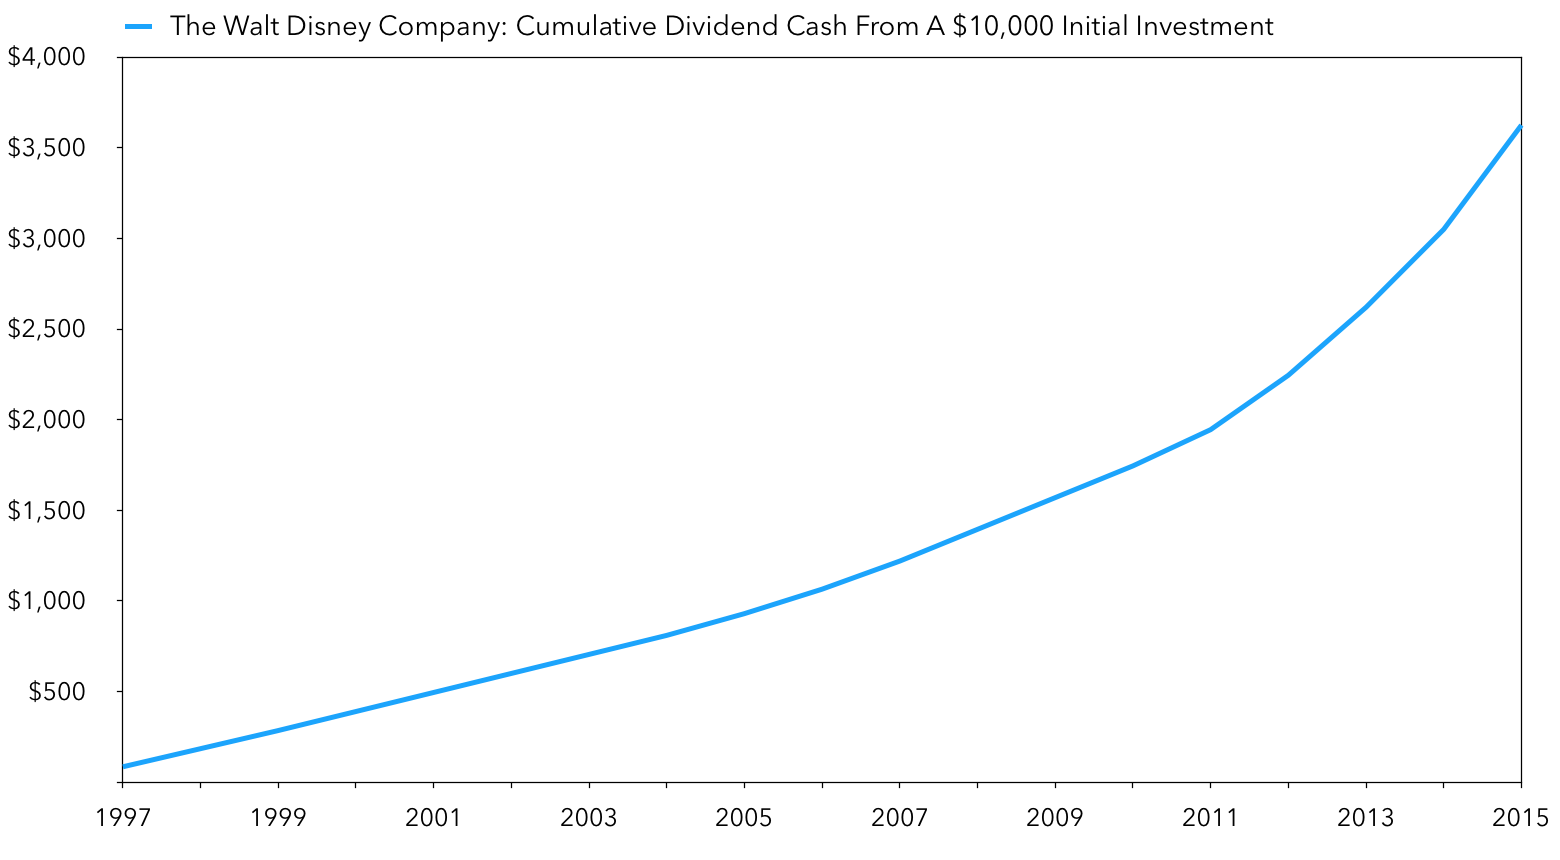 Disney Stock Returns: Cumulative Dividend Cash